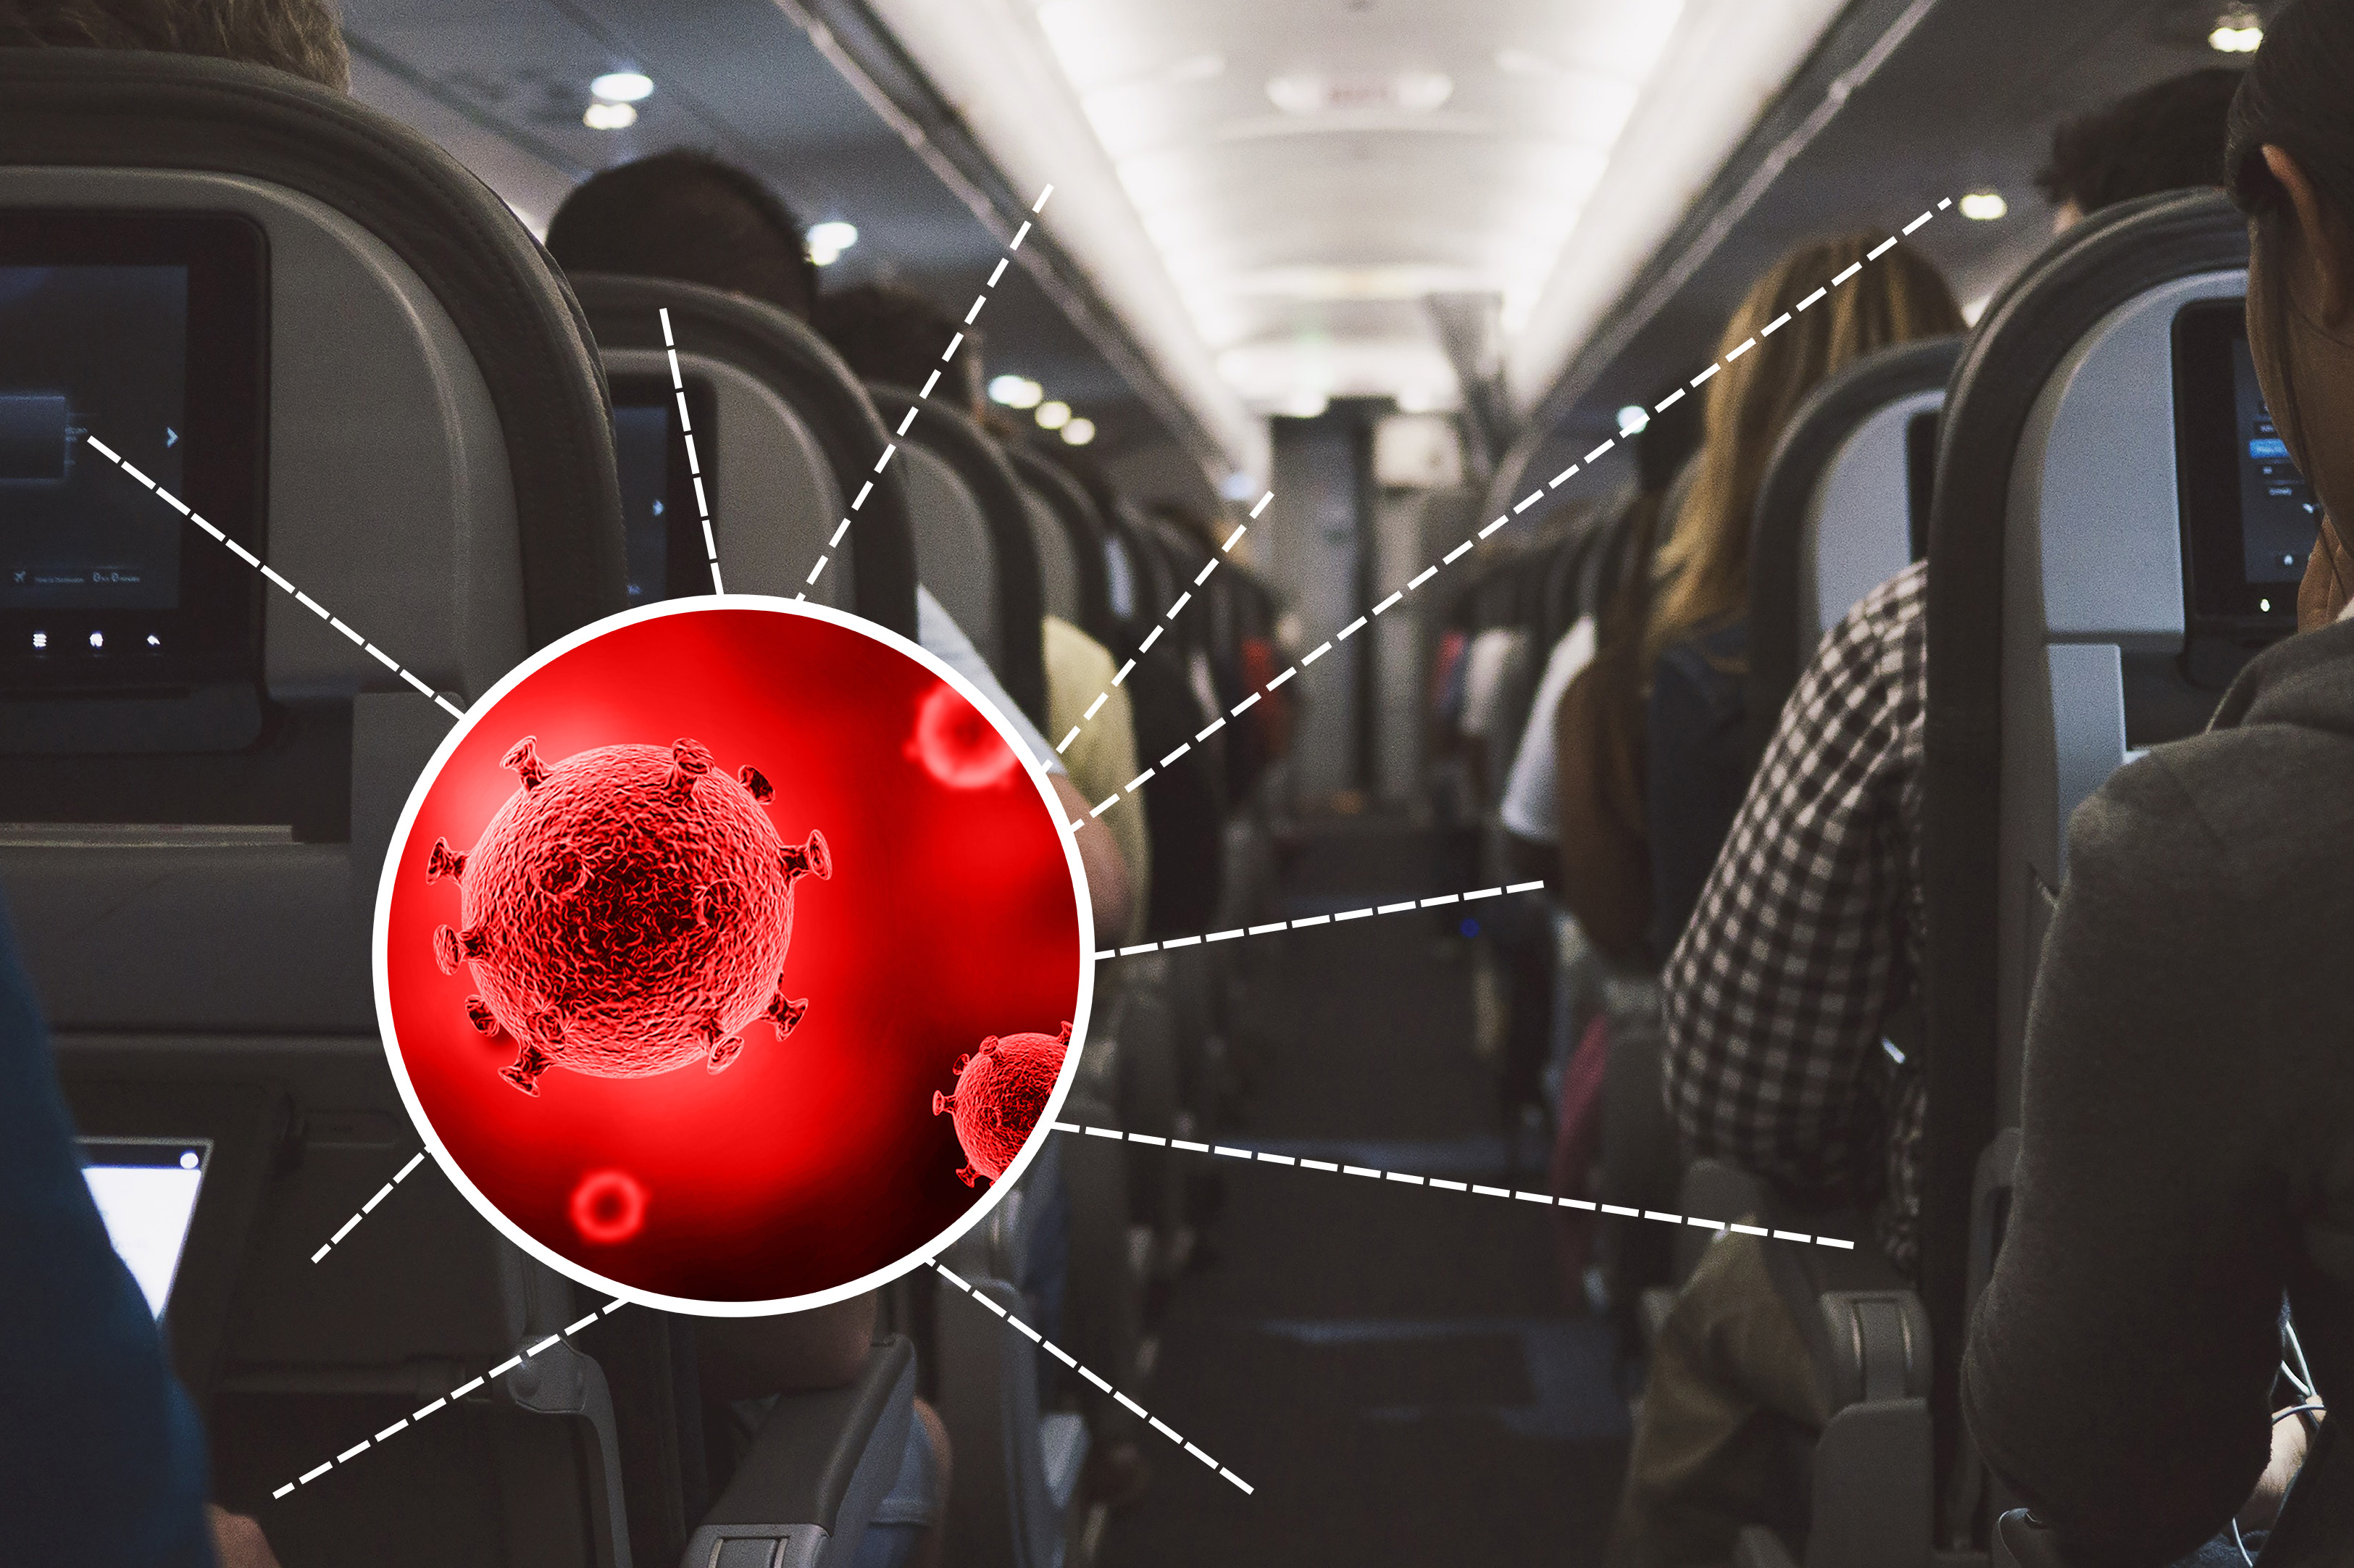 Krankheitserreger im Flugzeug